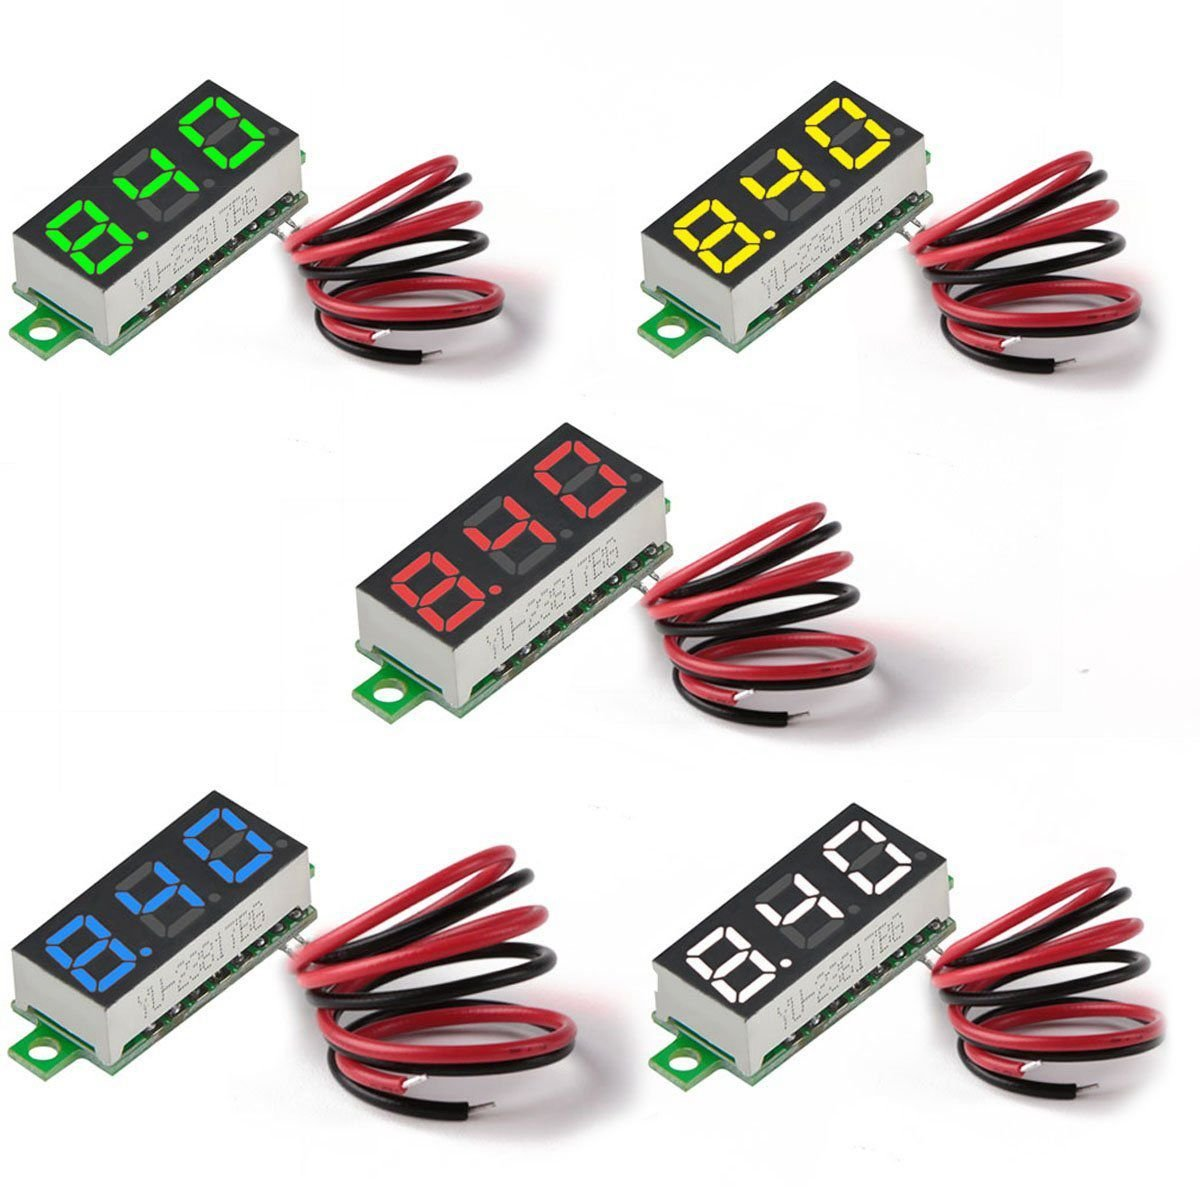 TOOGOO 5pcs Mini Digital DC Voltmeter 0.28 inch Two-Wire 2.5V-30V Mini Digital DC Voltmeter Voltage Tester Meter 5 Colours